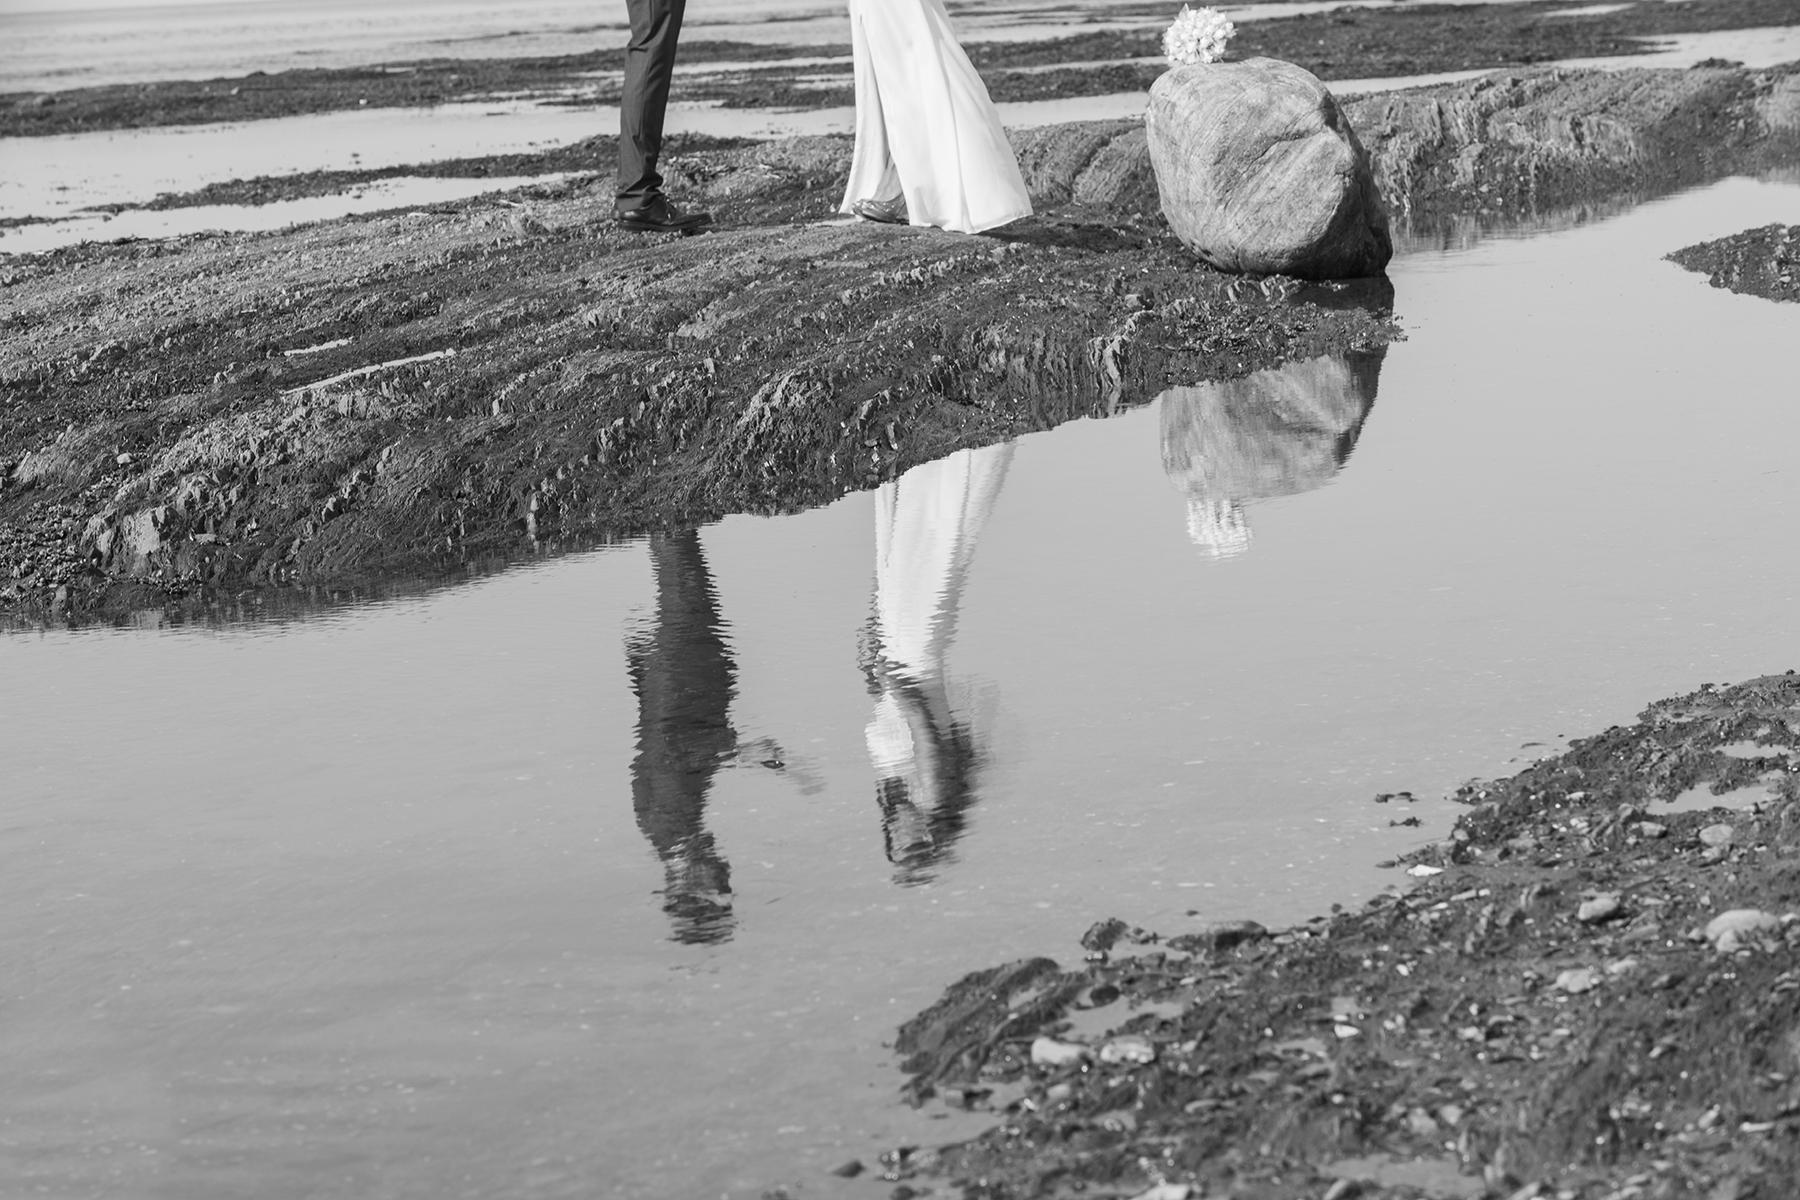 FolioPhoto-Mariage-AnnieJF-23aout14-54-NB.JPG